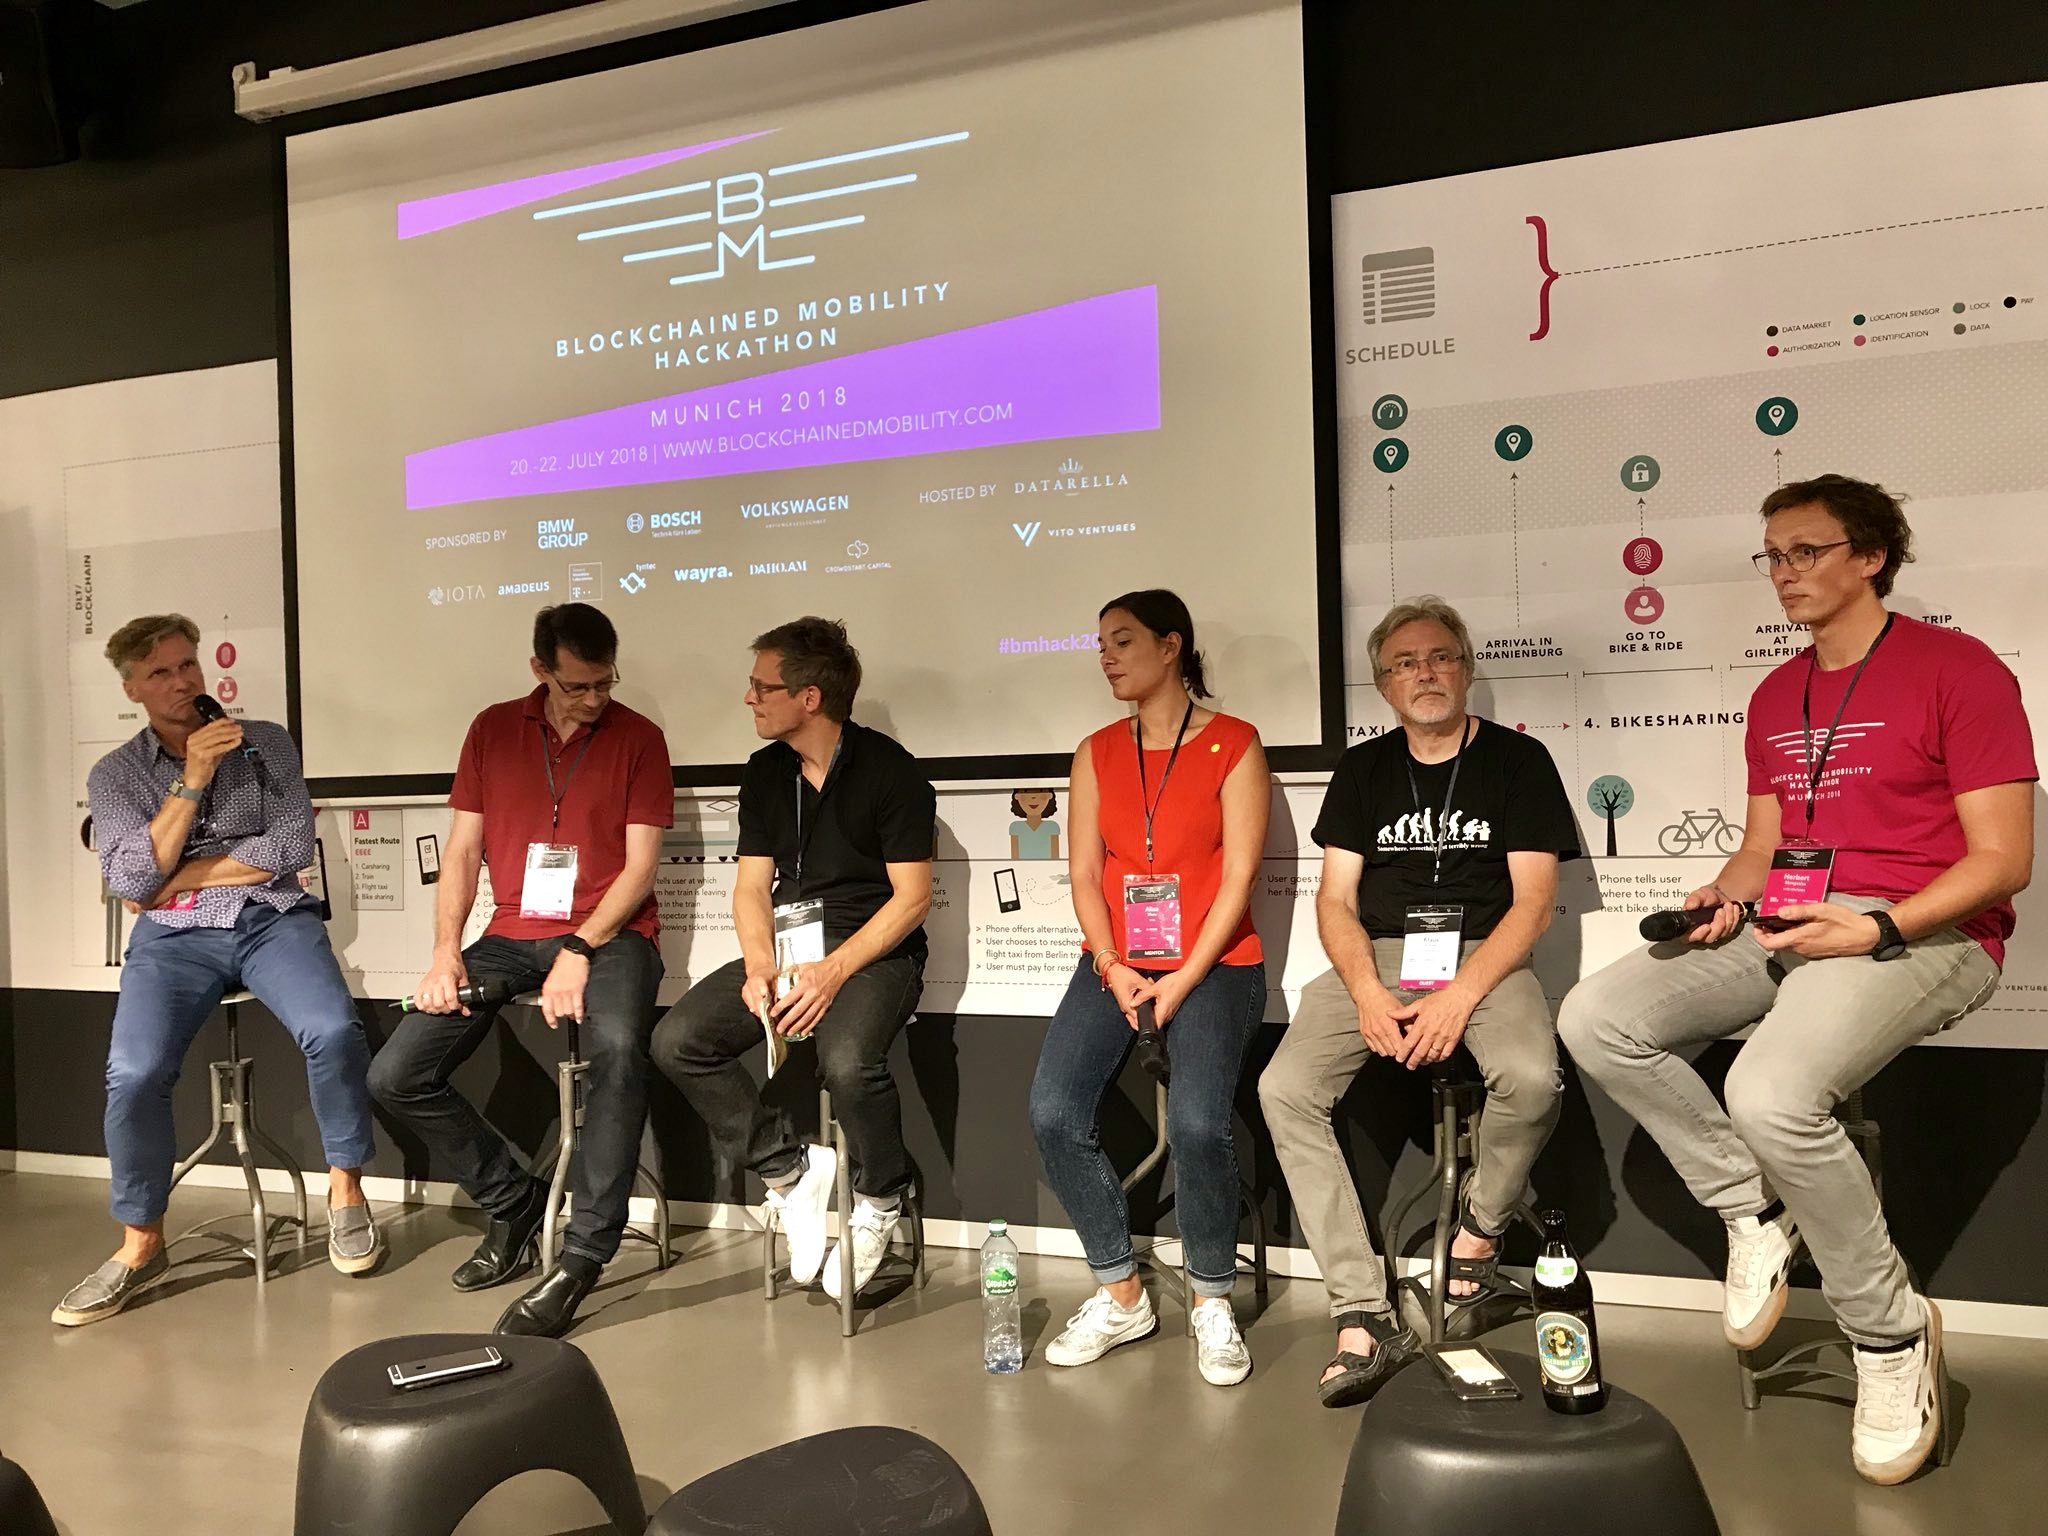 BlockchainedMobility Panel